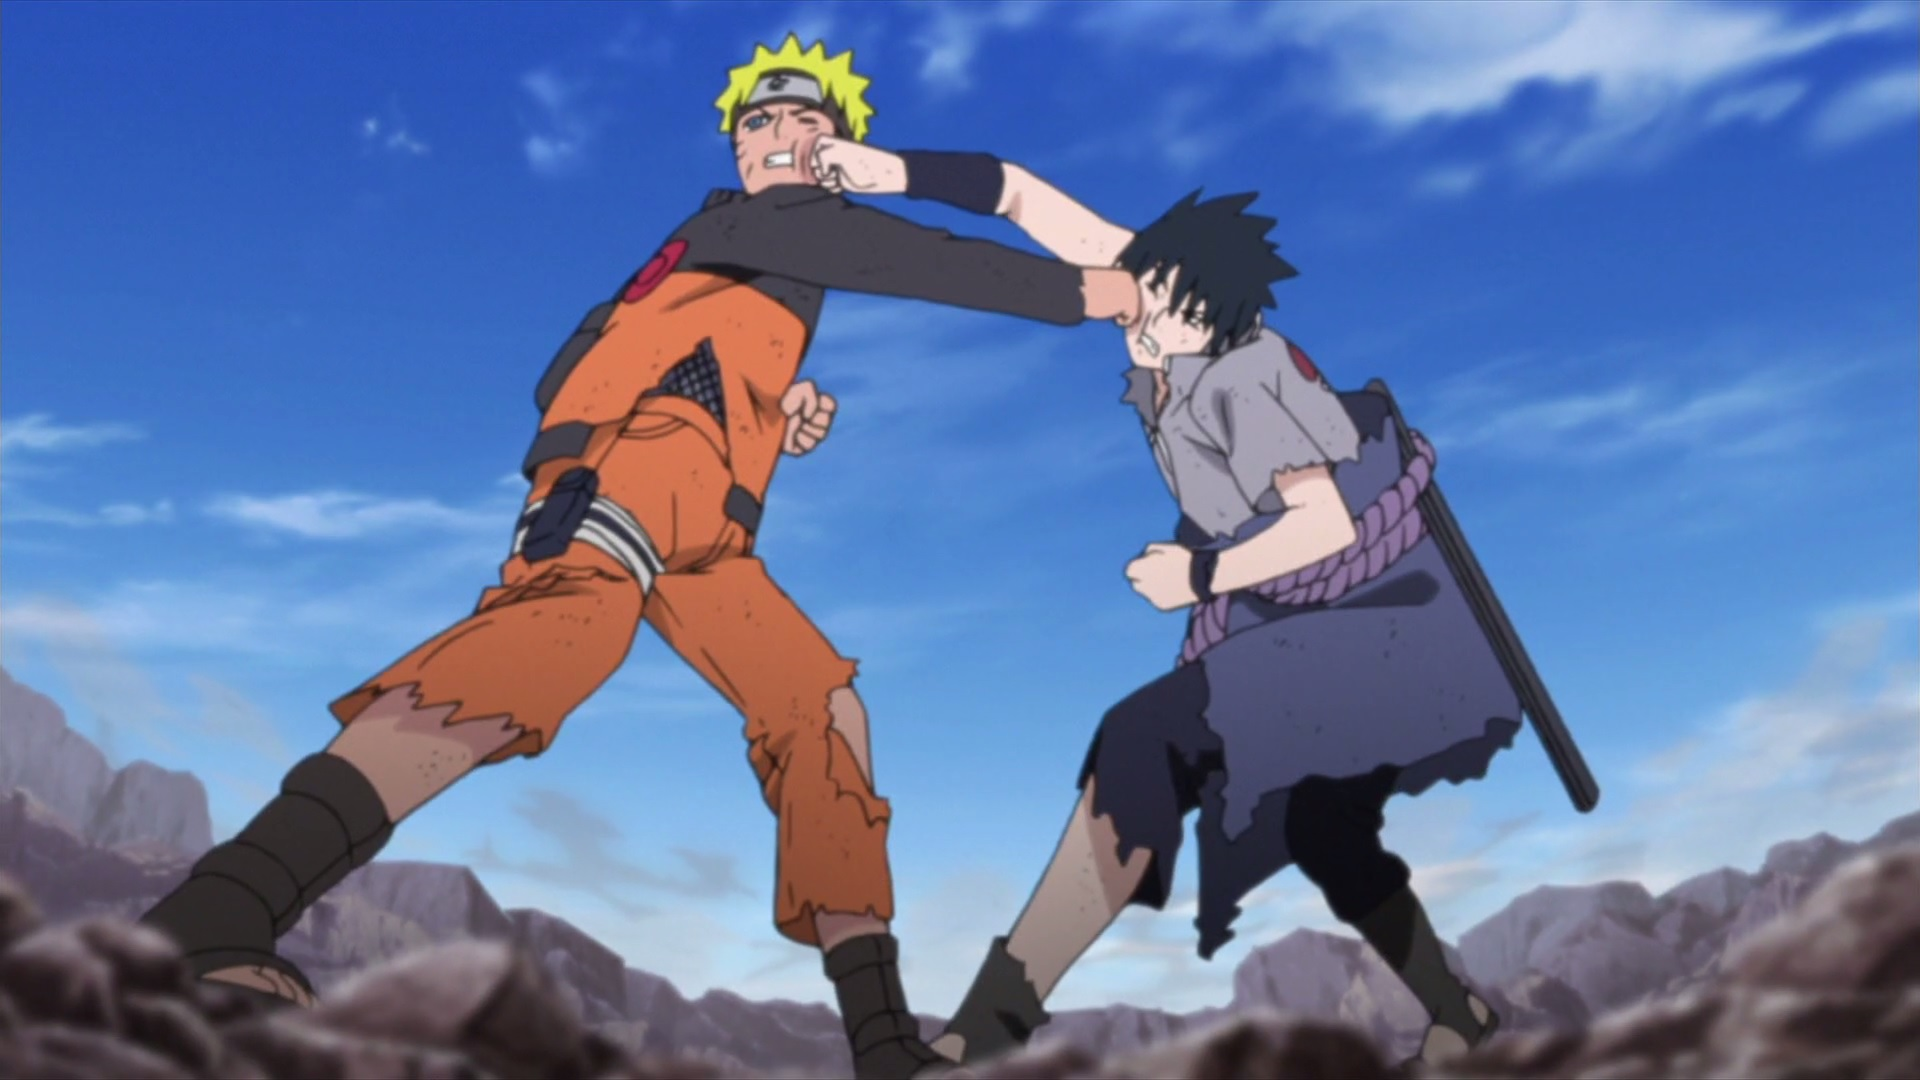 Naruto vs sasuke luta completa fullhd - 5 3